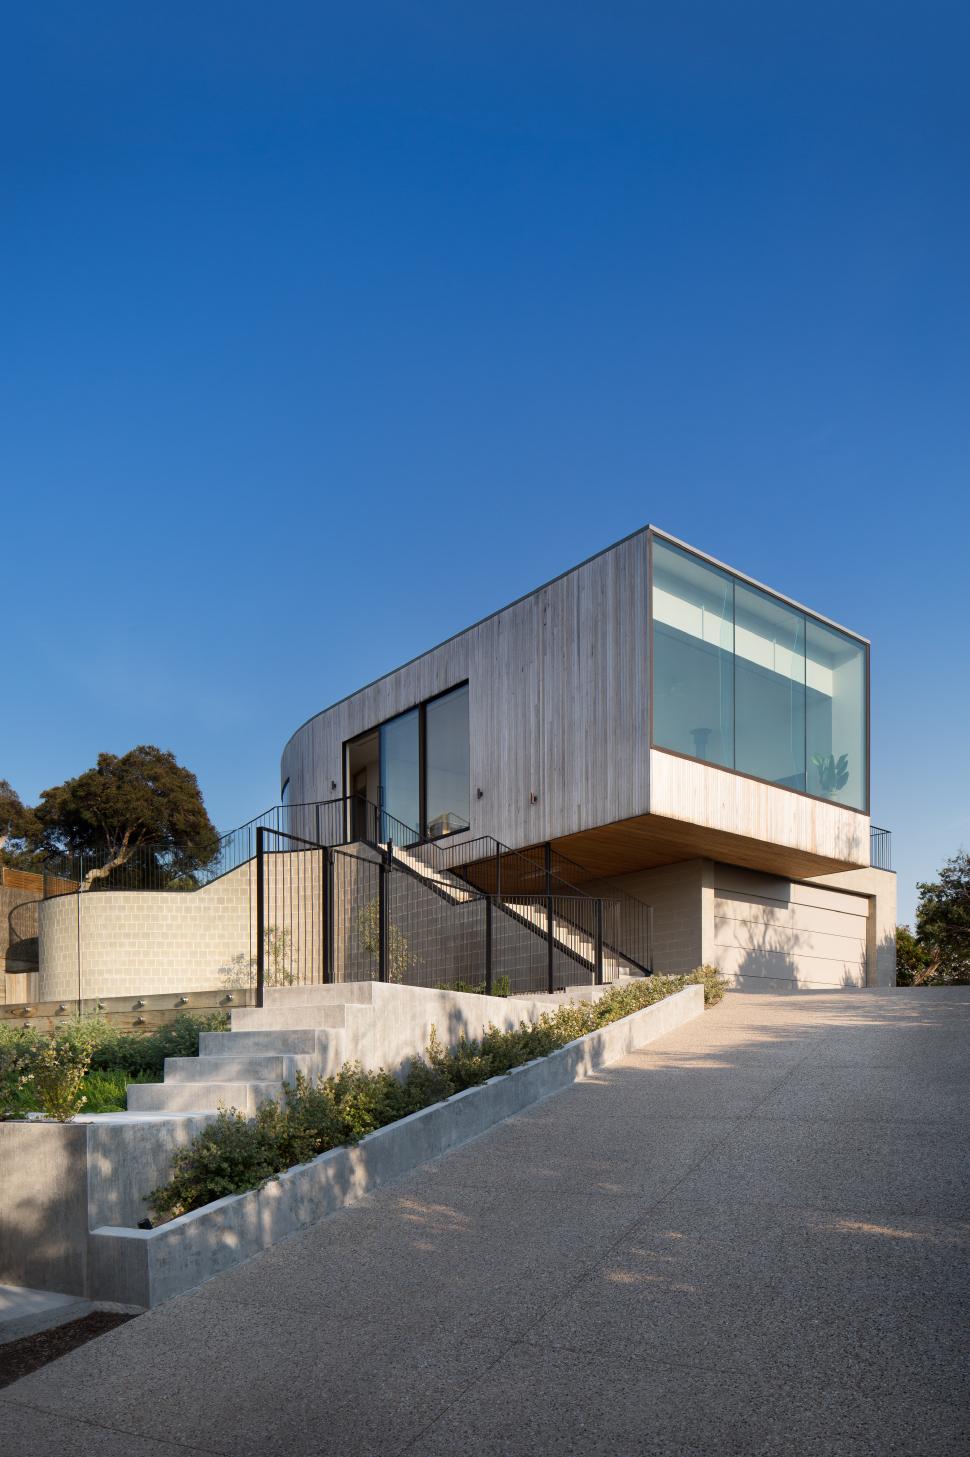 parkside beach house by cera stribley architects_6